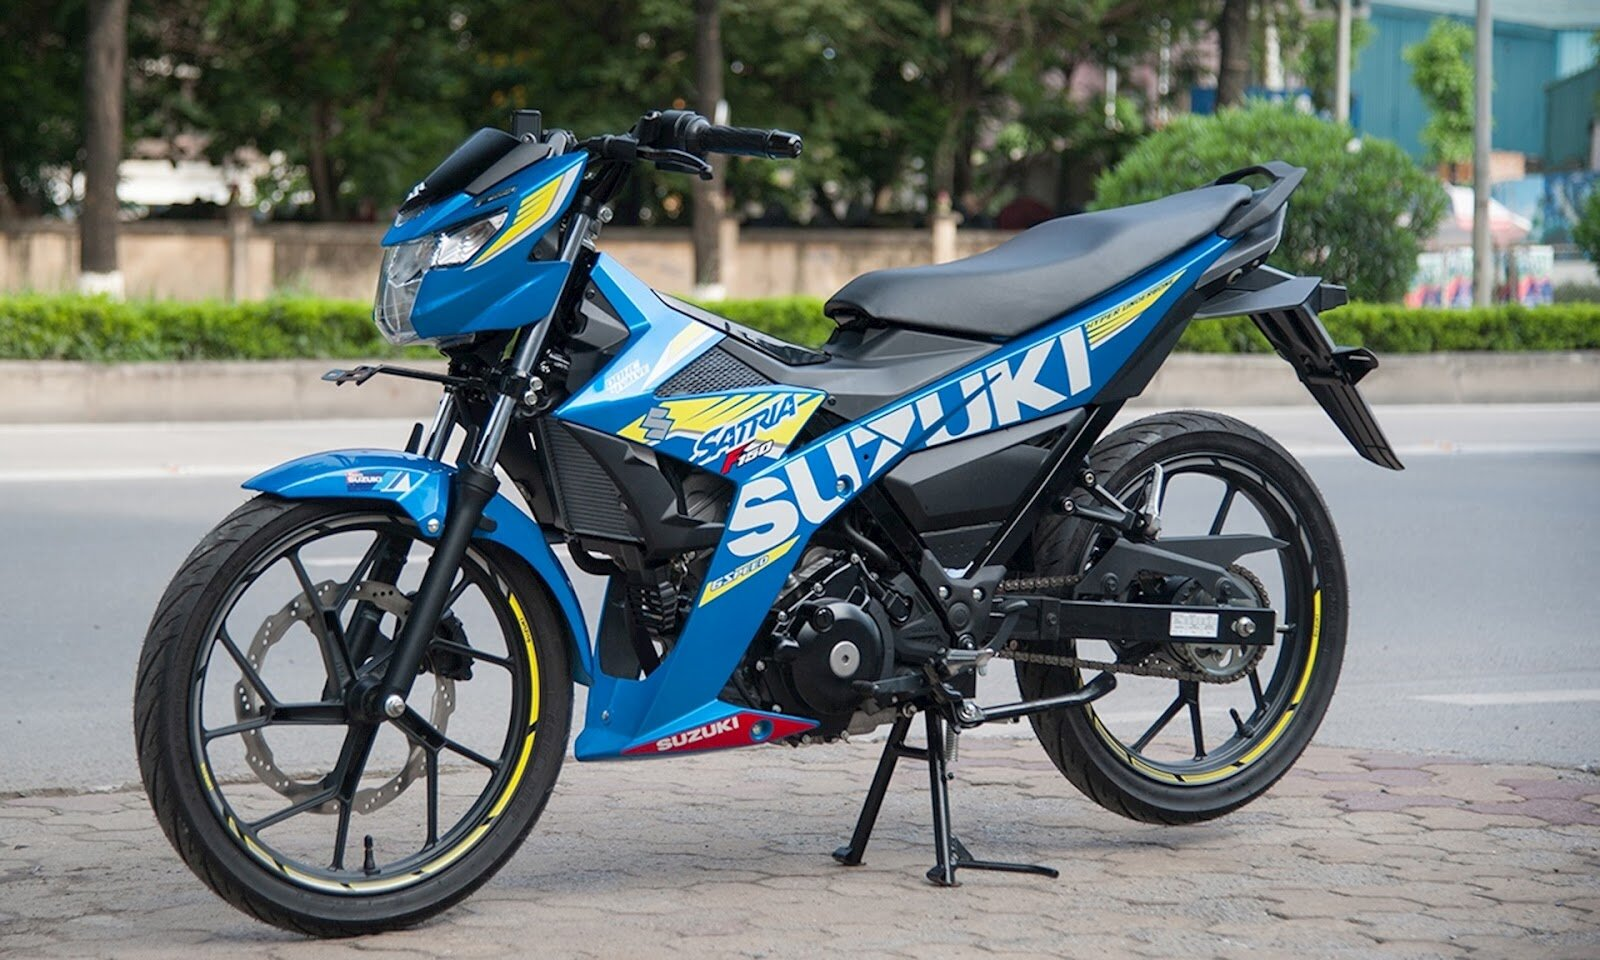 Xe máy Suzuki Satria F150